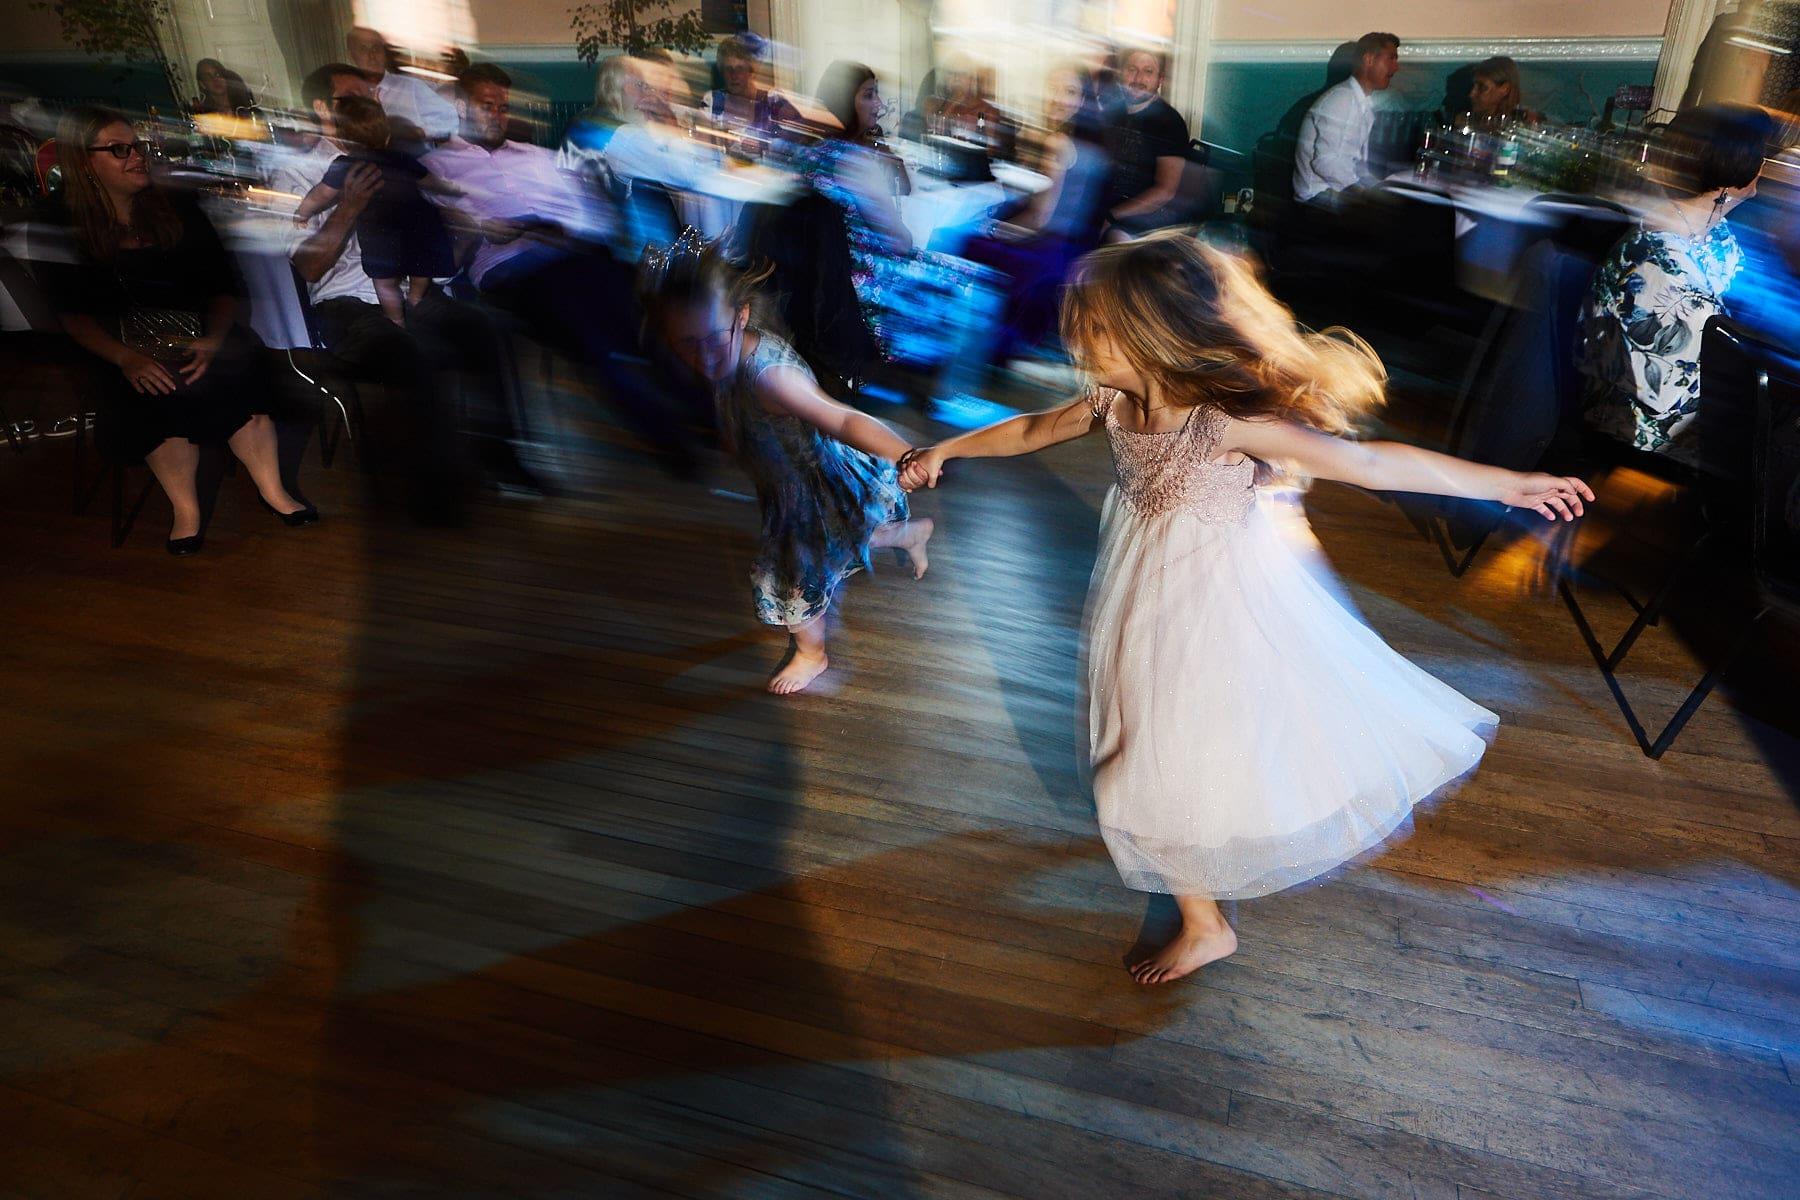 Children run across a dance floor at the marriage of her parents